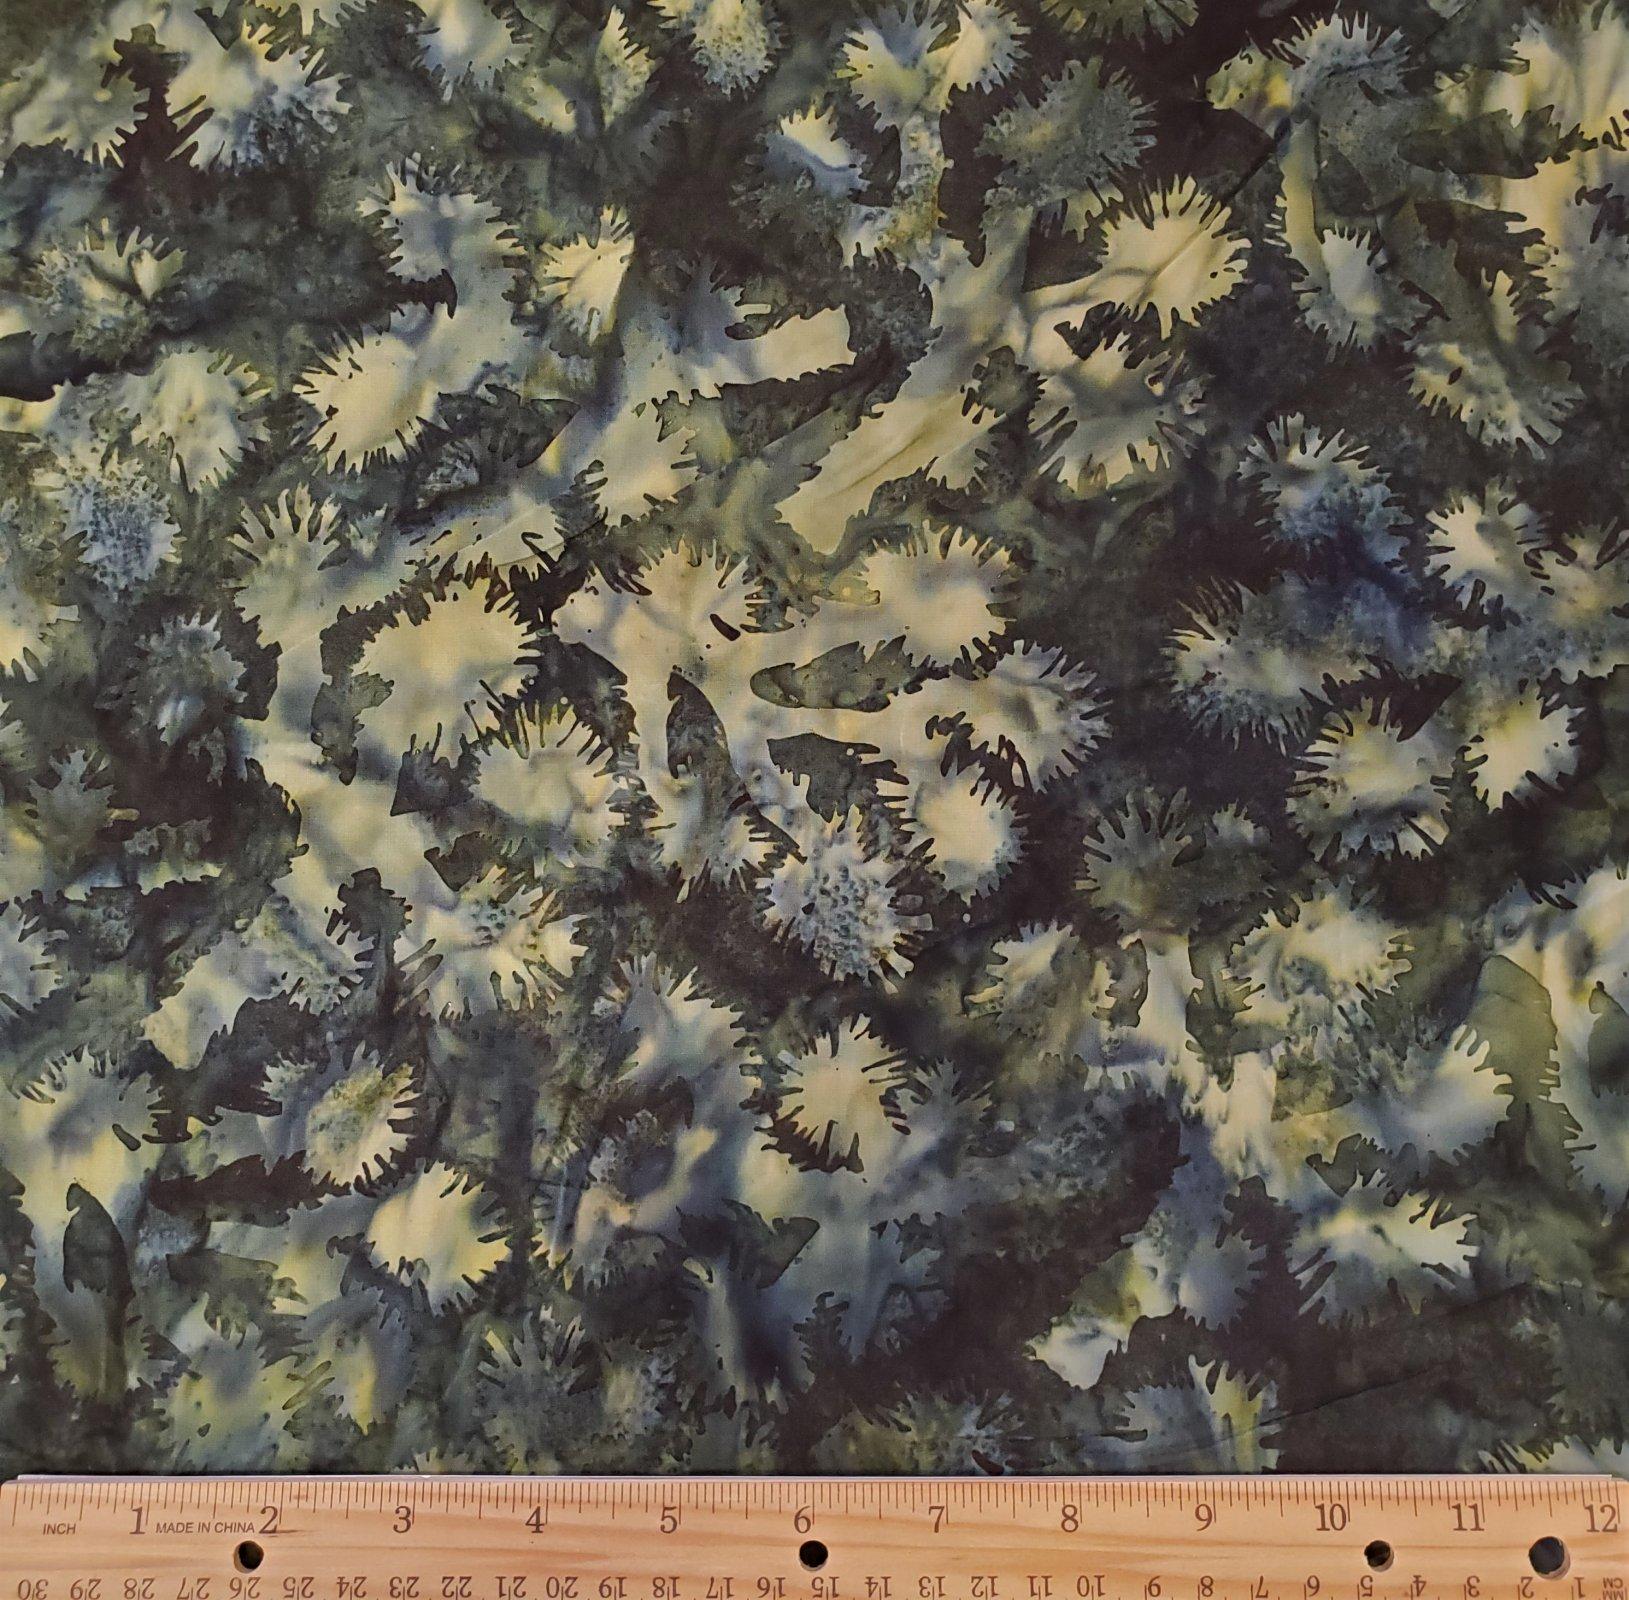 Bali Batik - Joshua Tree Dublin - S2308-252